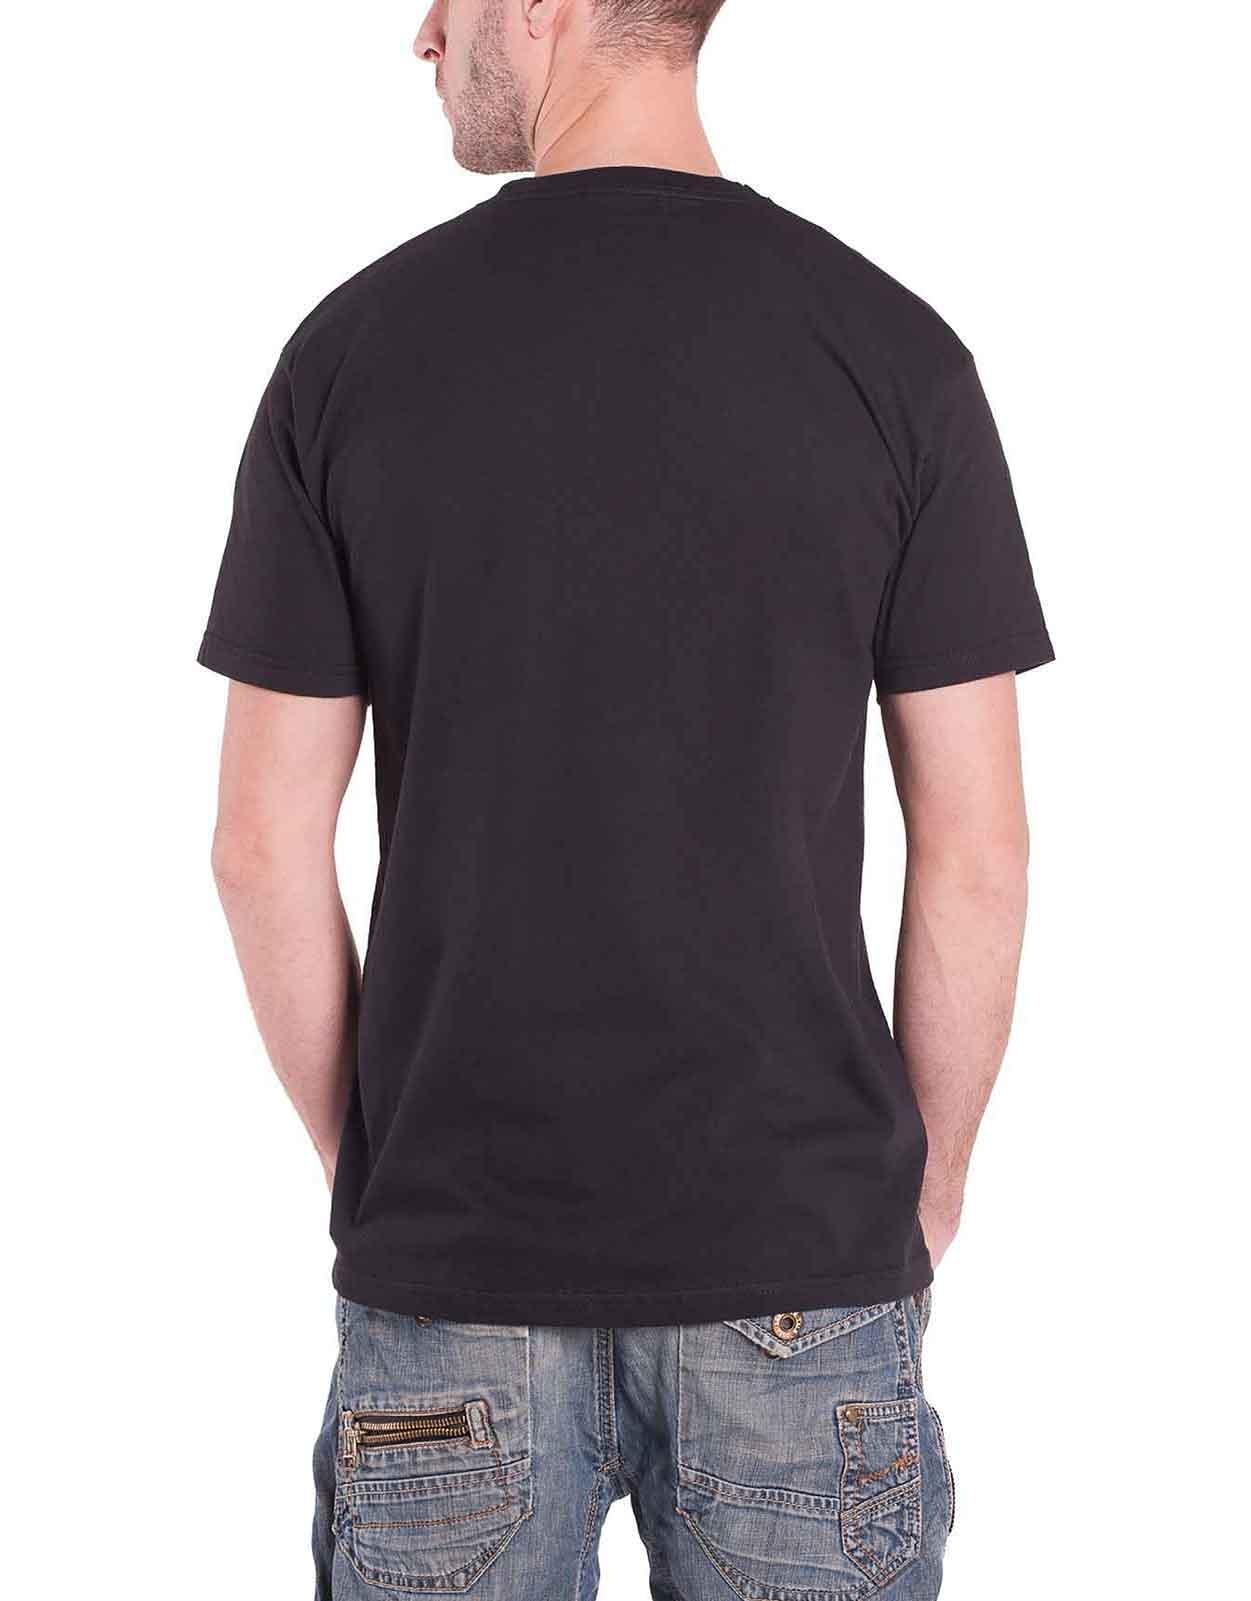 Motorhead-T-Shirt-Lemmy-RIP-England-warpig-clean-your-clock-official-new-mens Indexbild 33